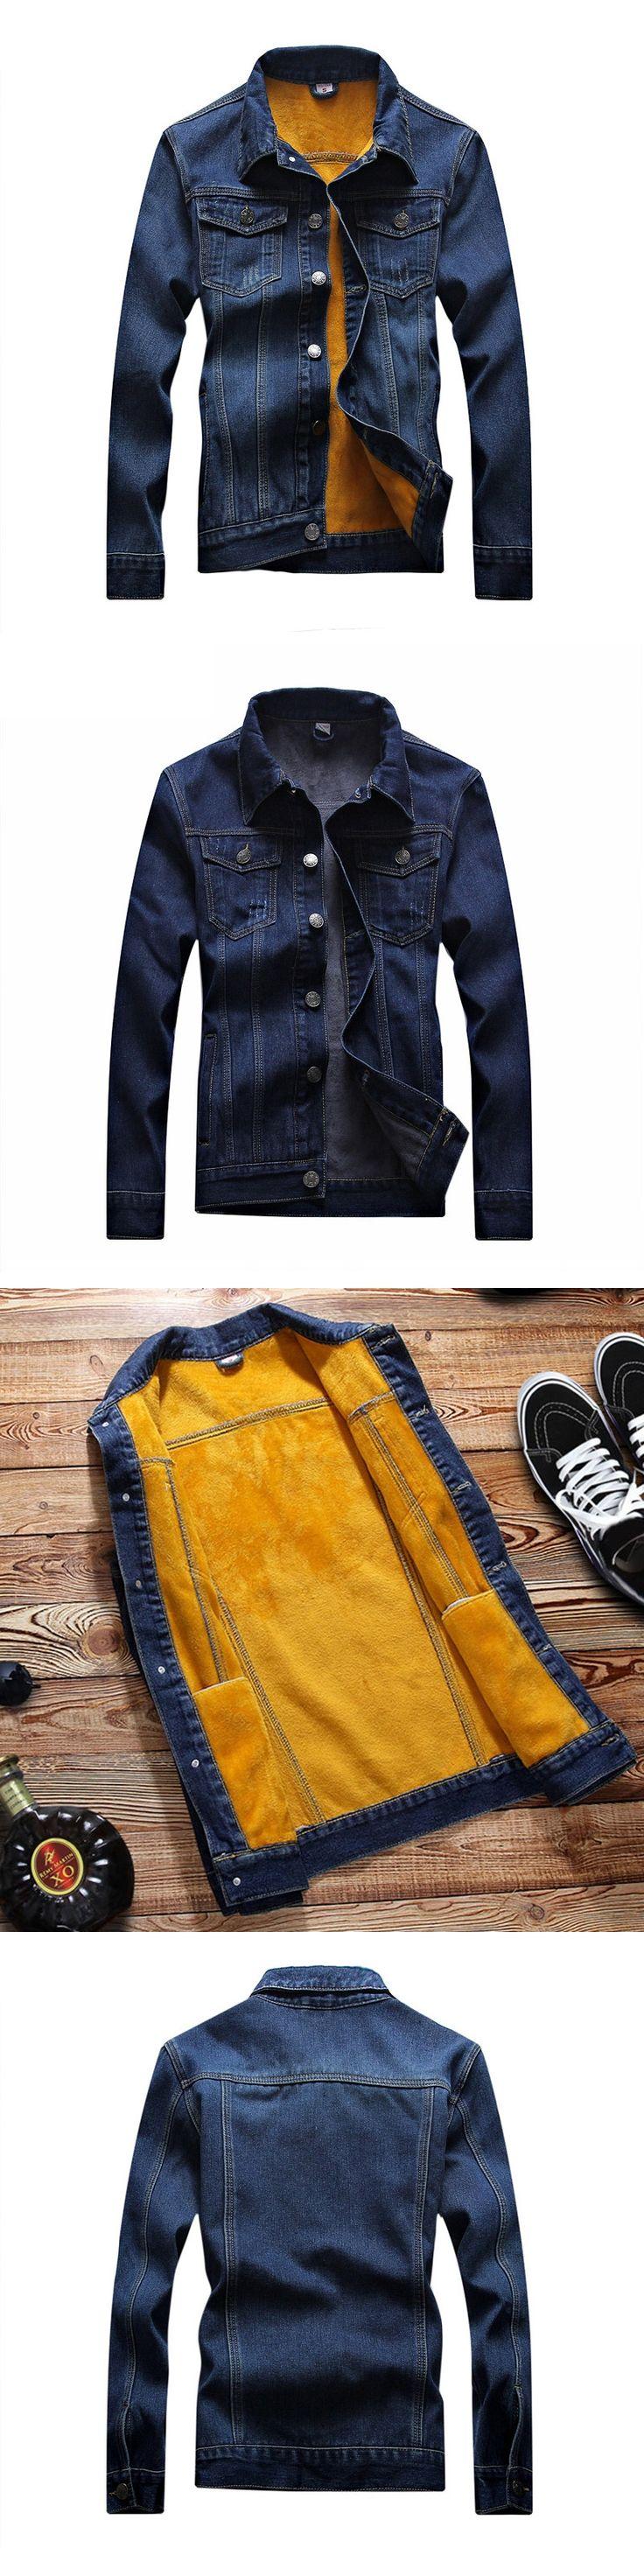 Kedera 2017 Fashion Winter Mens Denim Jackets Coat With Fleece Blue 4XL Warm Washed Fashion Thicken Outwear